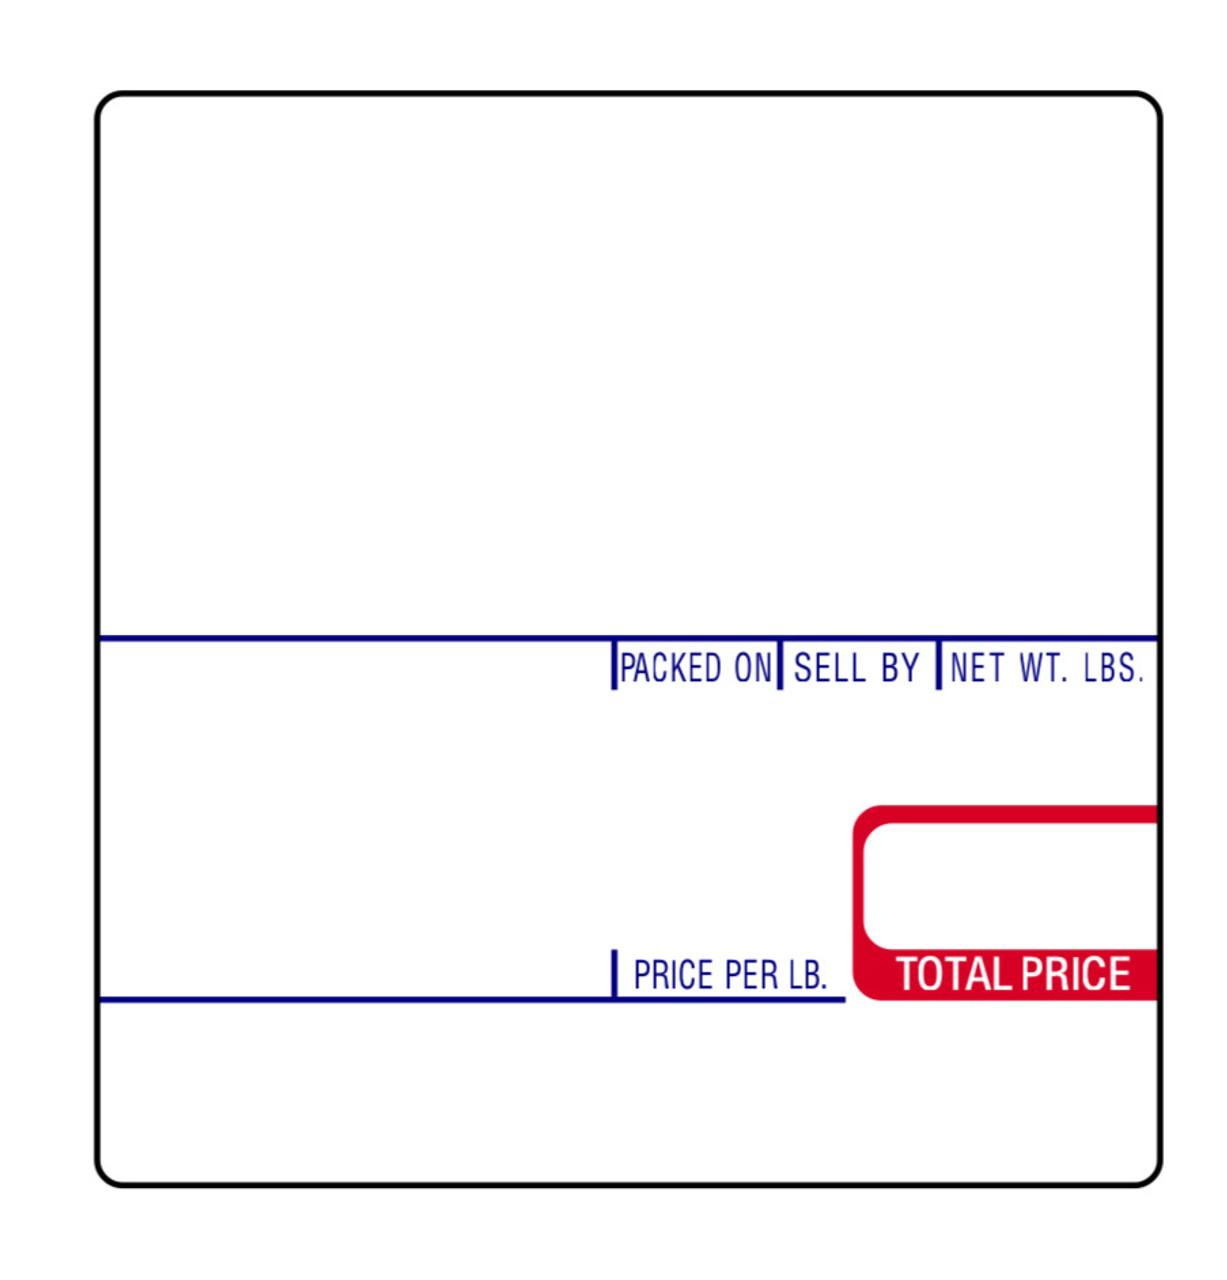 CAS Label LST-8020 58x60mm UPC/Ingredients